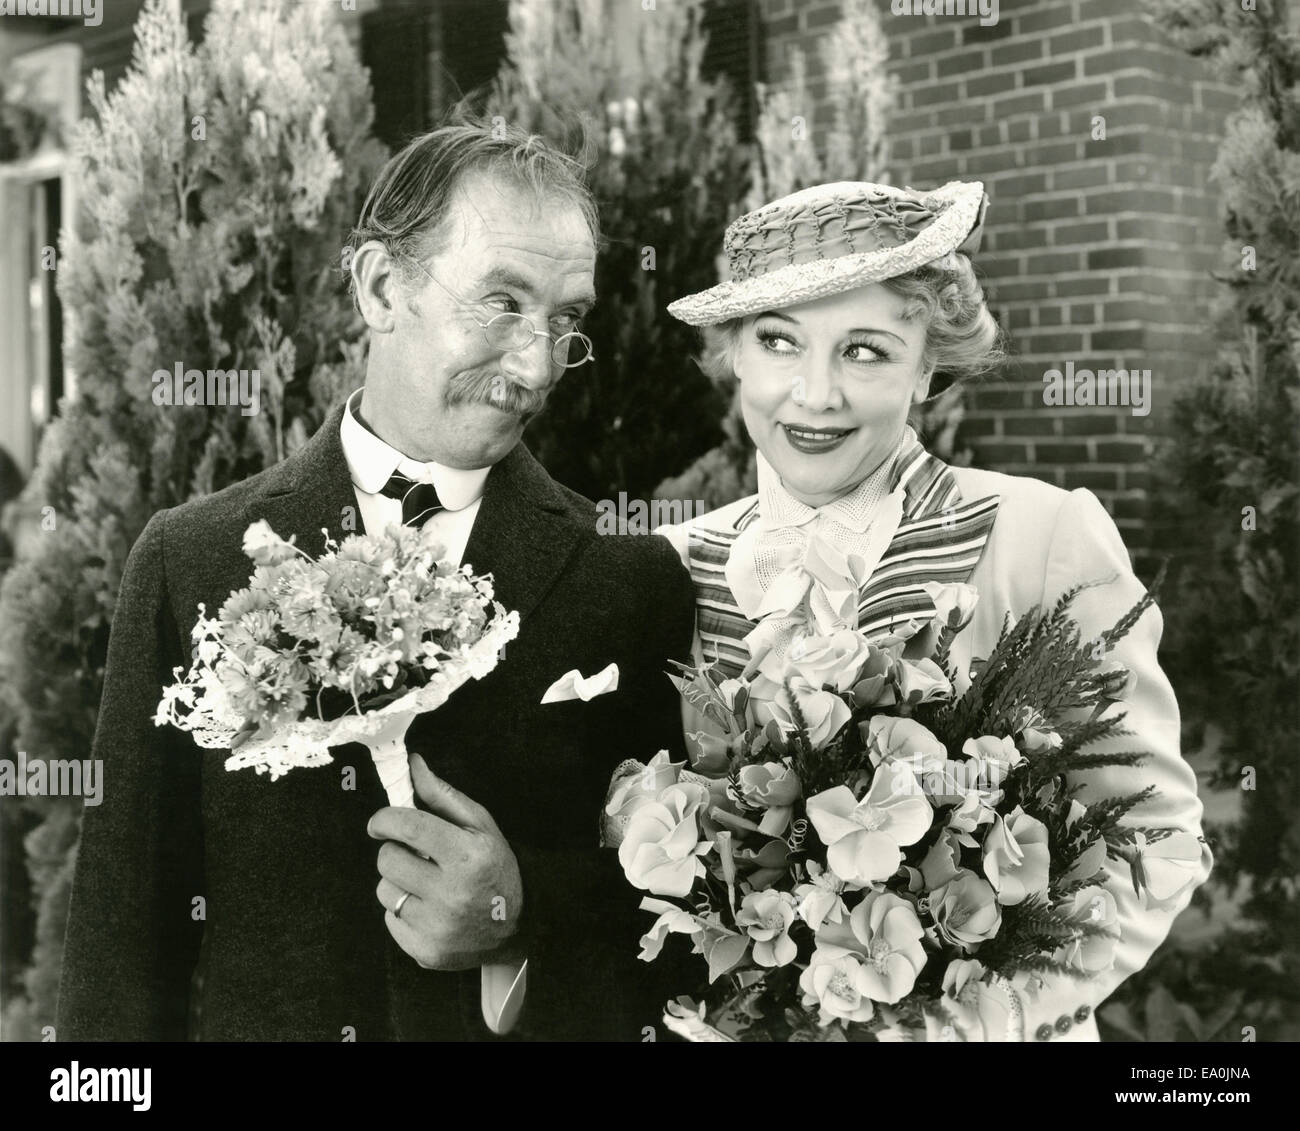 Wedding bliss - Stock Image